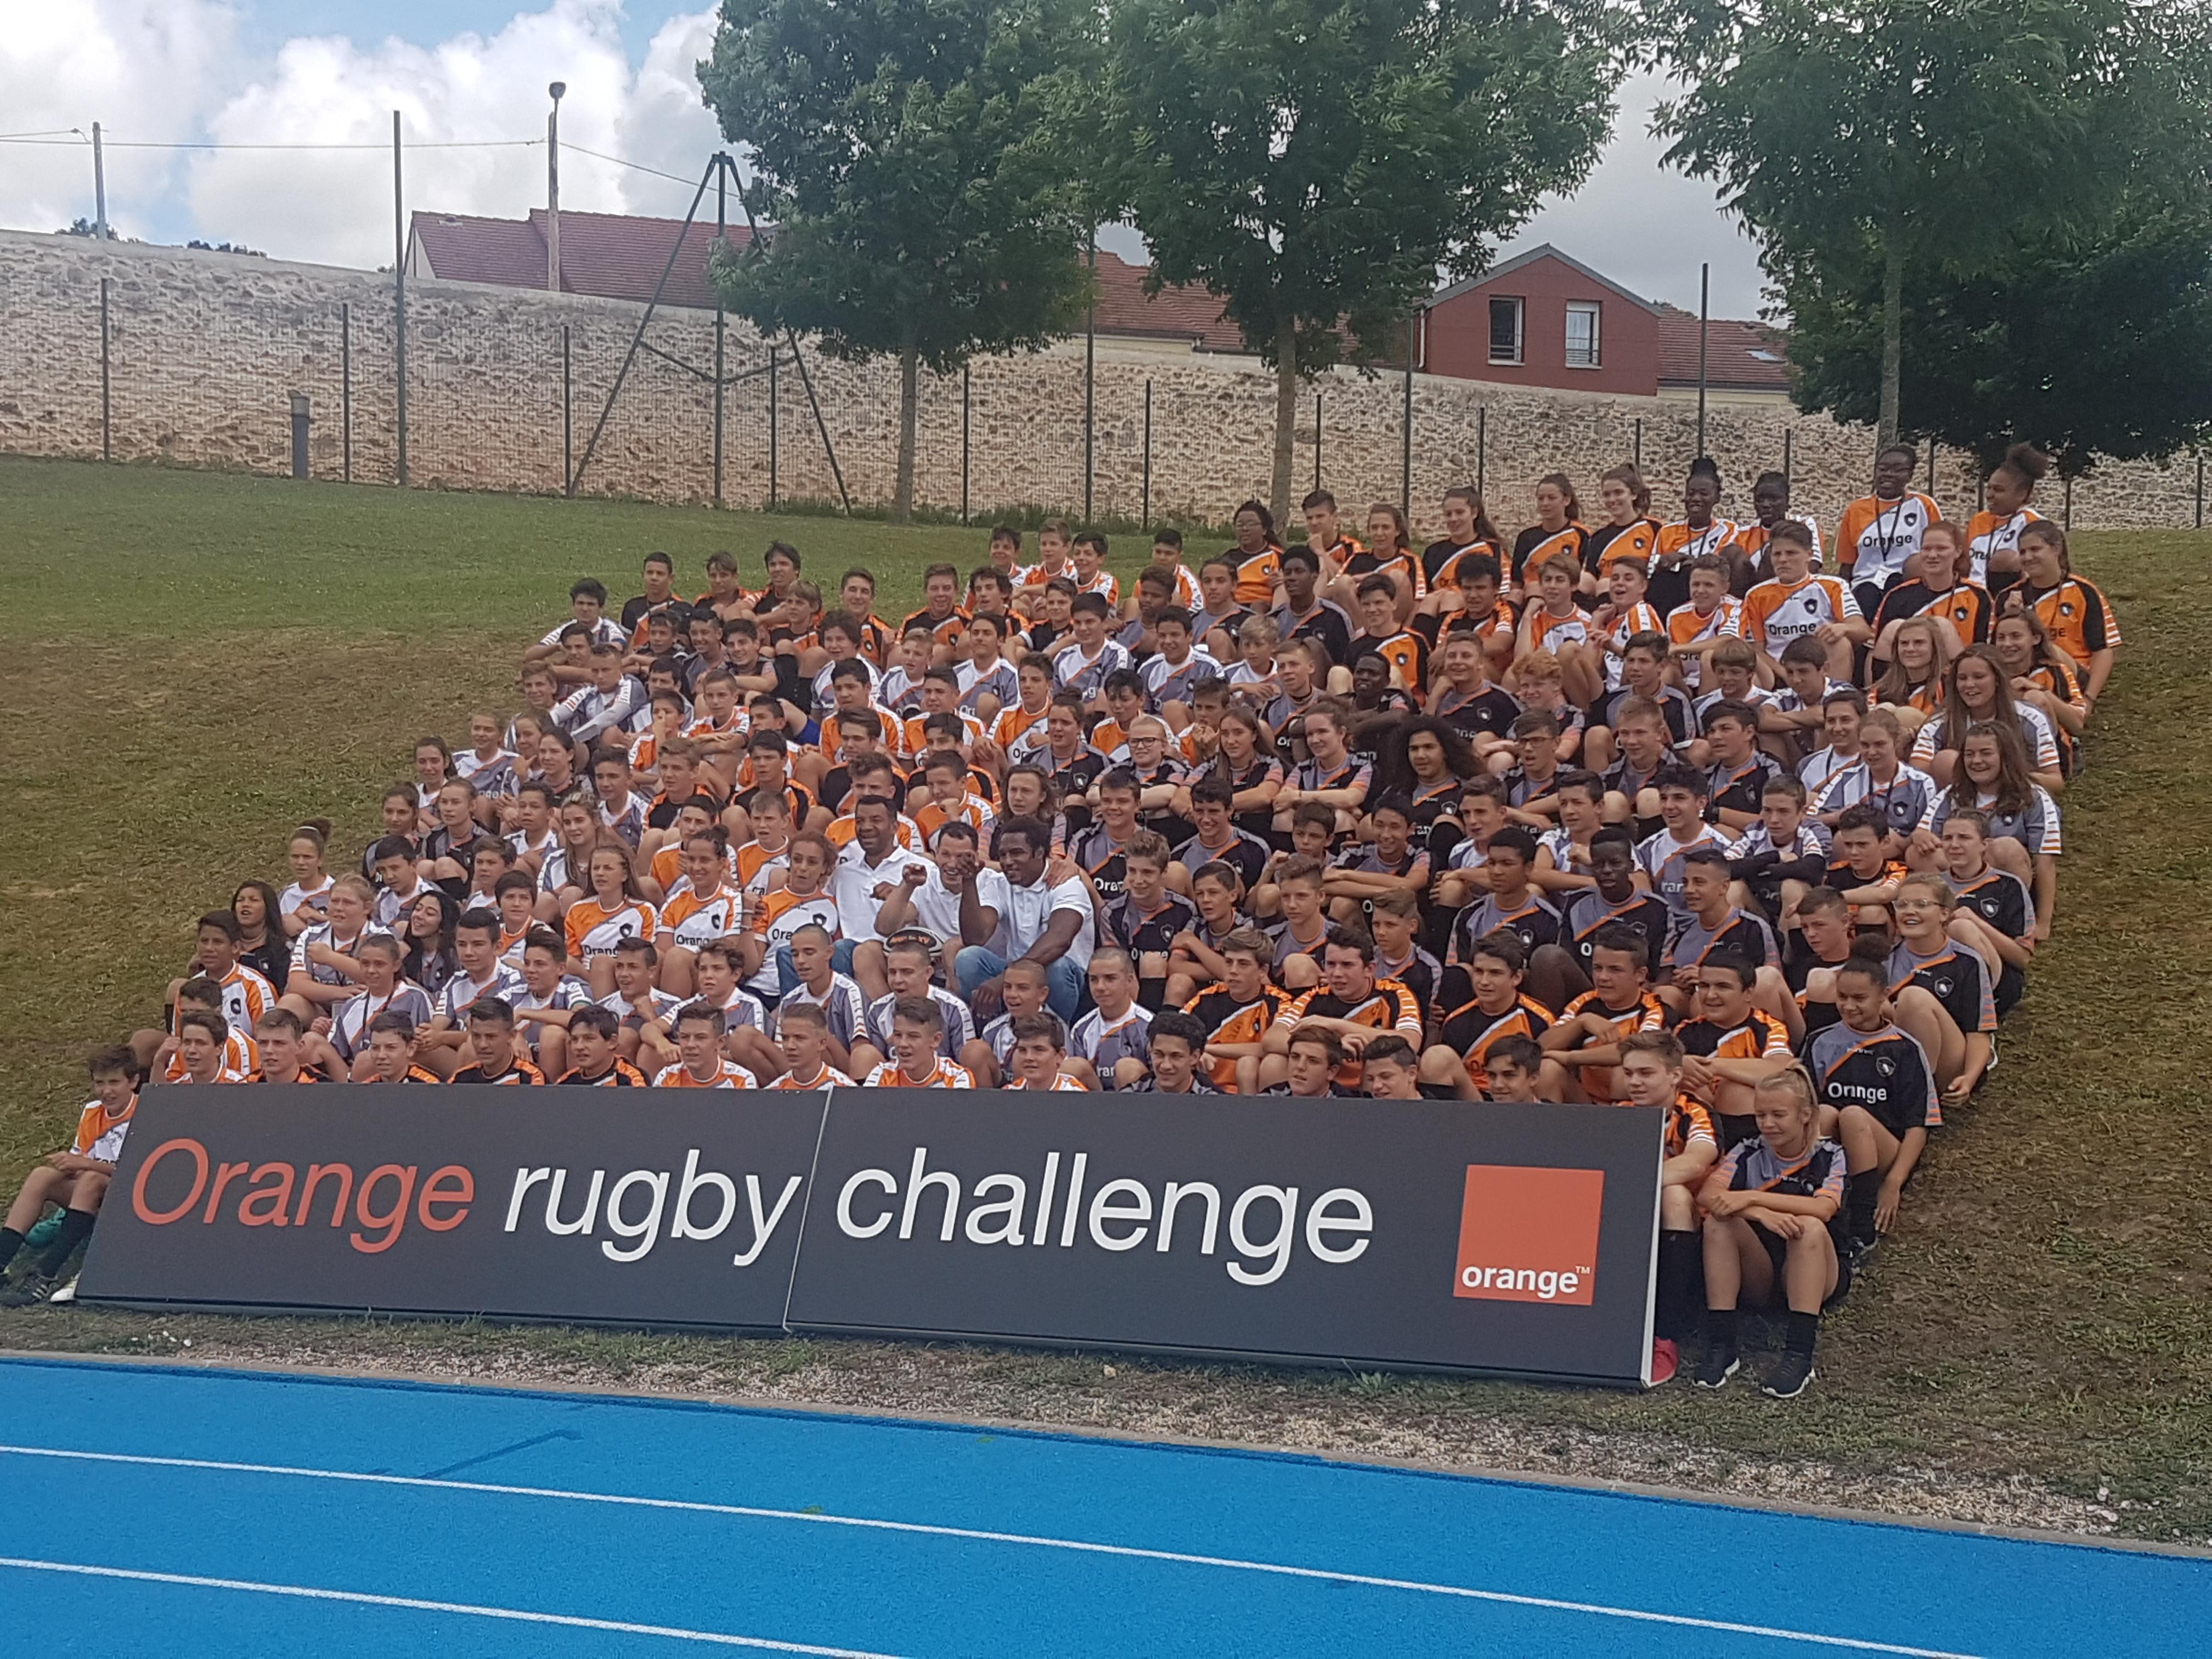 le rt chalon remporte le challenge orange national ligue de rugby bourgogne franche comt. Black Bedroom Furniture Sets. Home Design Ideas